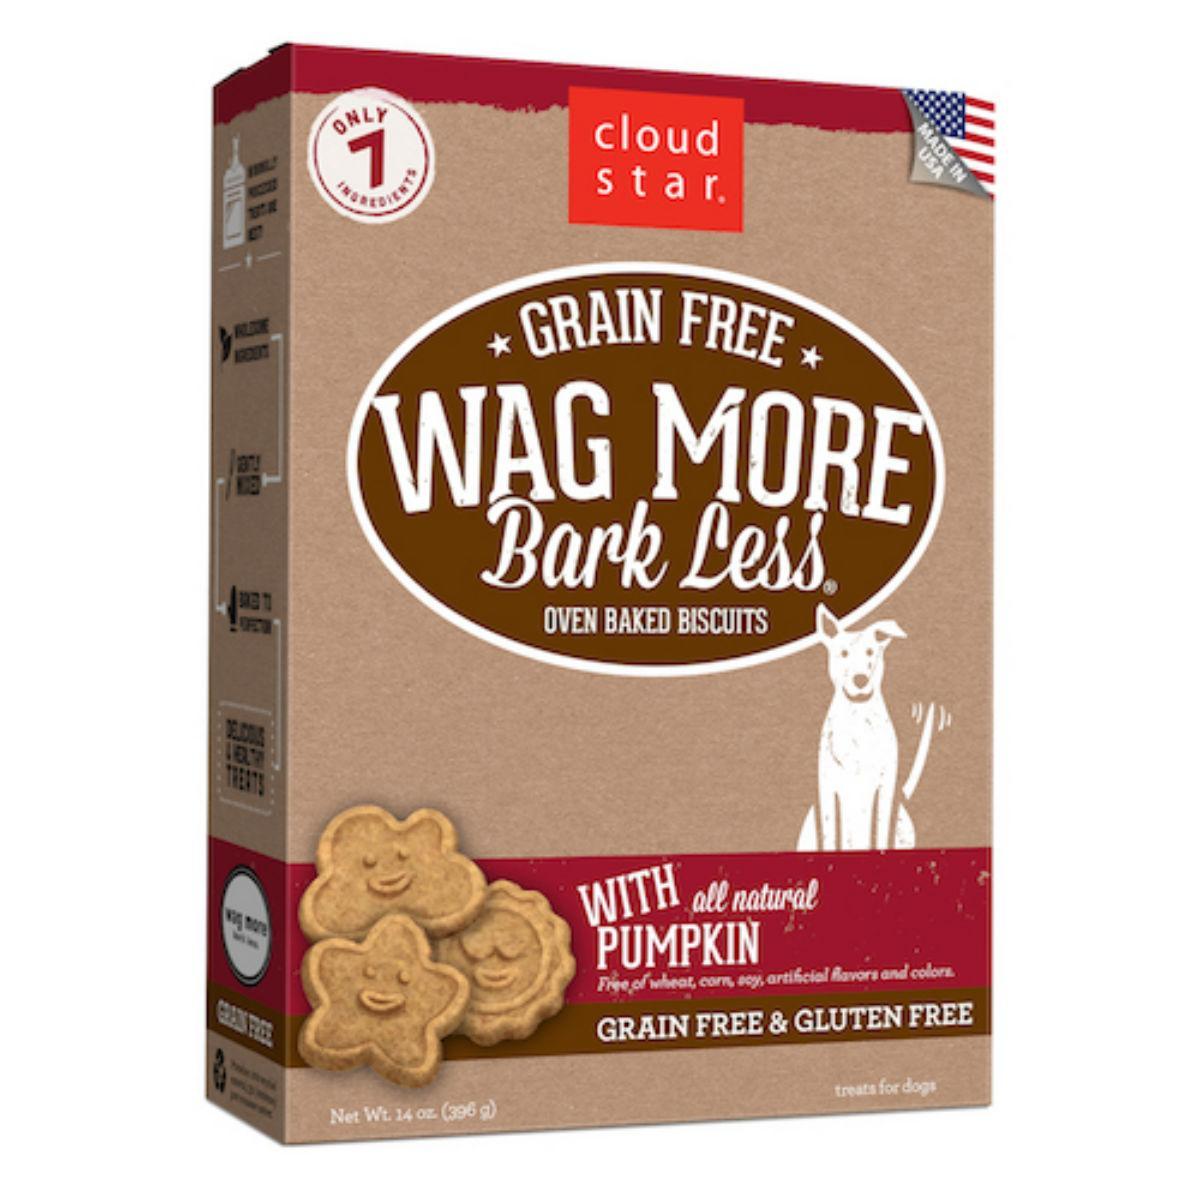 Wag More Bark Less Grain Free Baked Dog Treat - Pumpkin